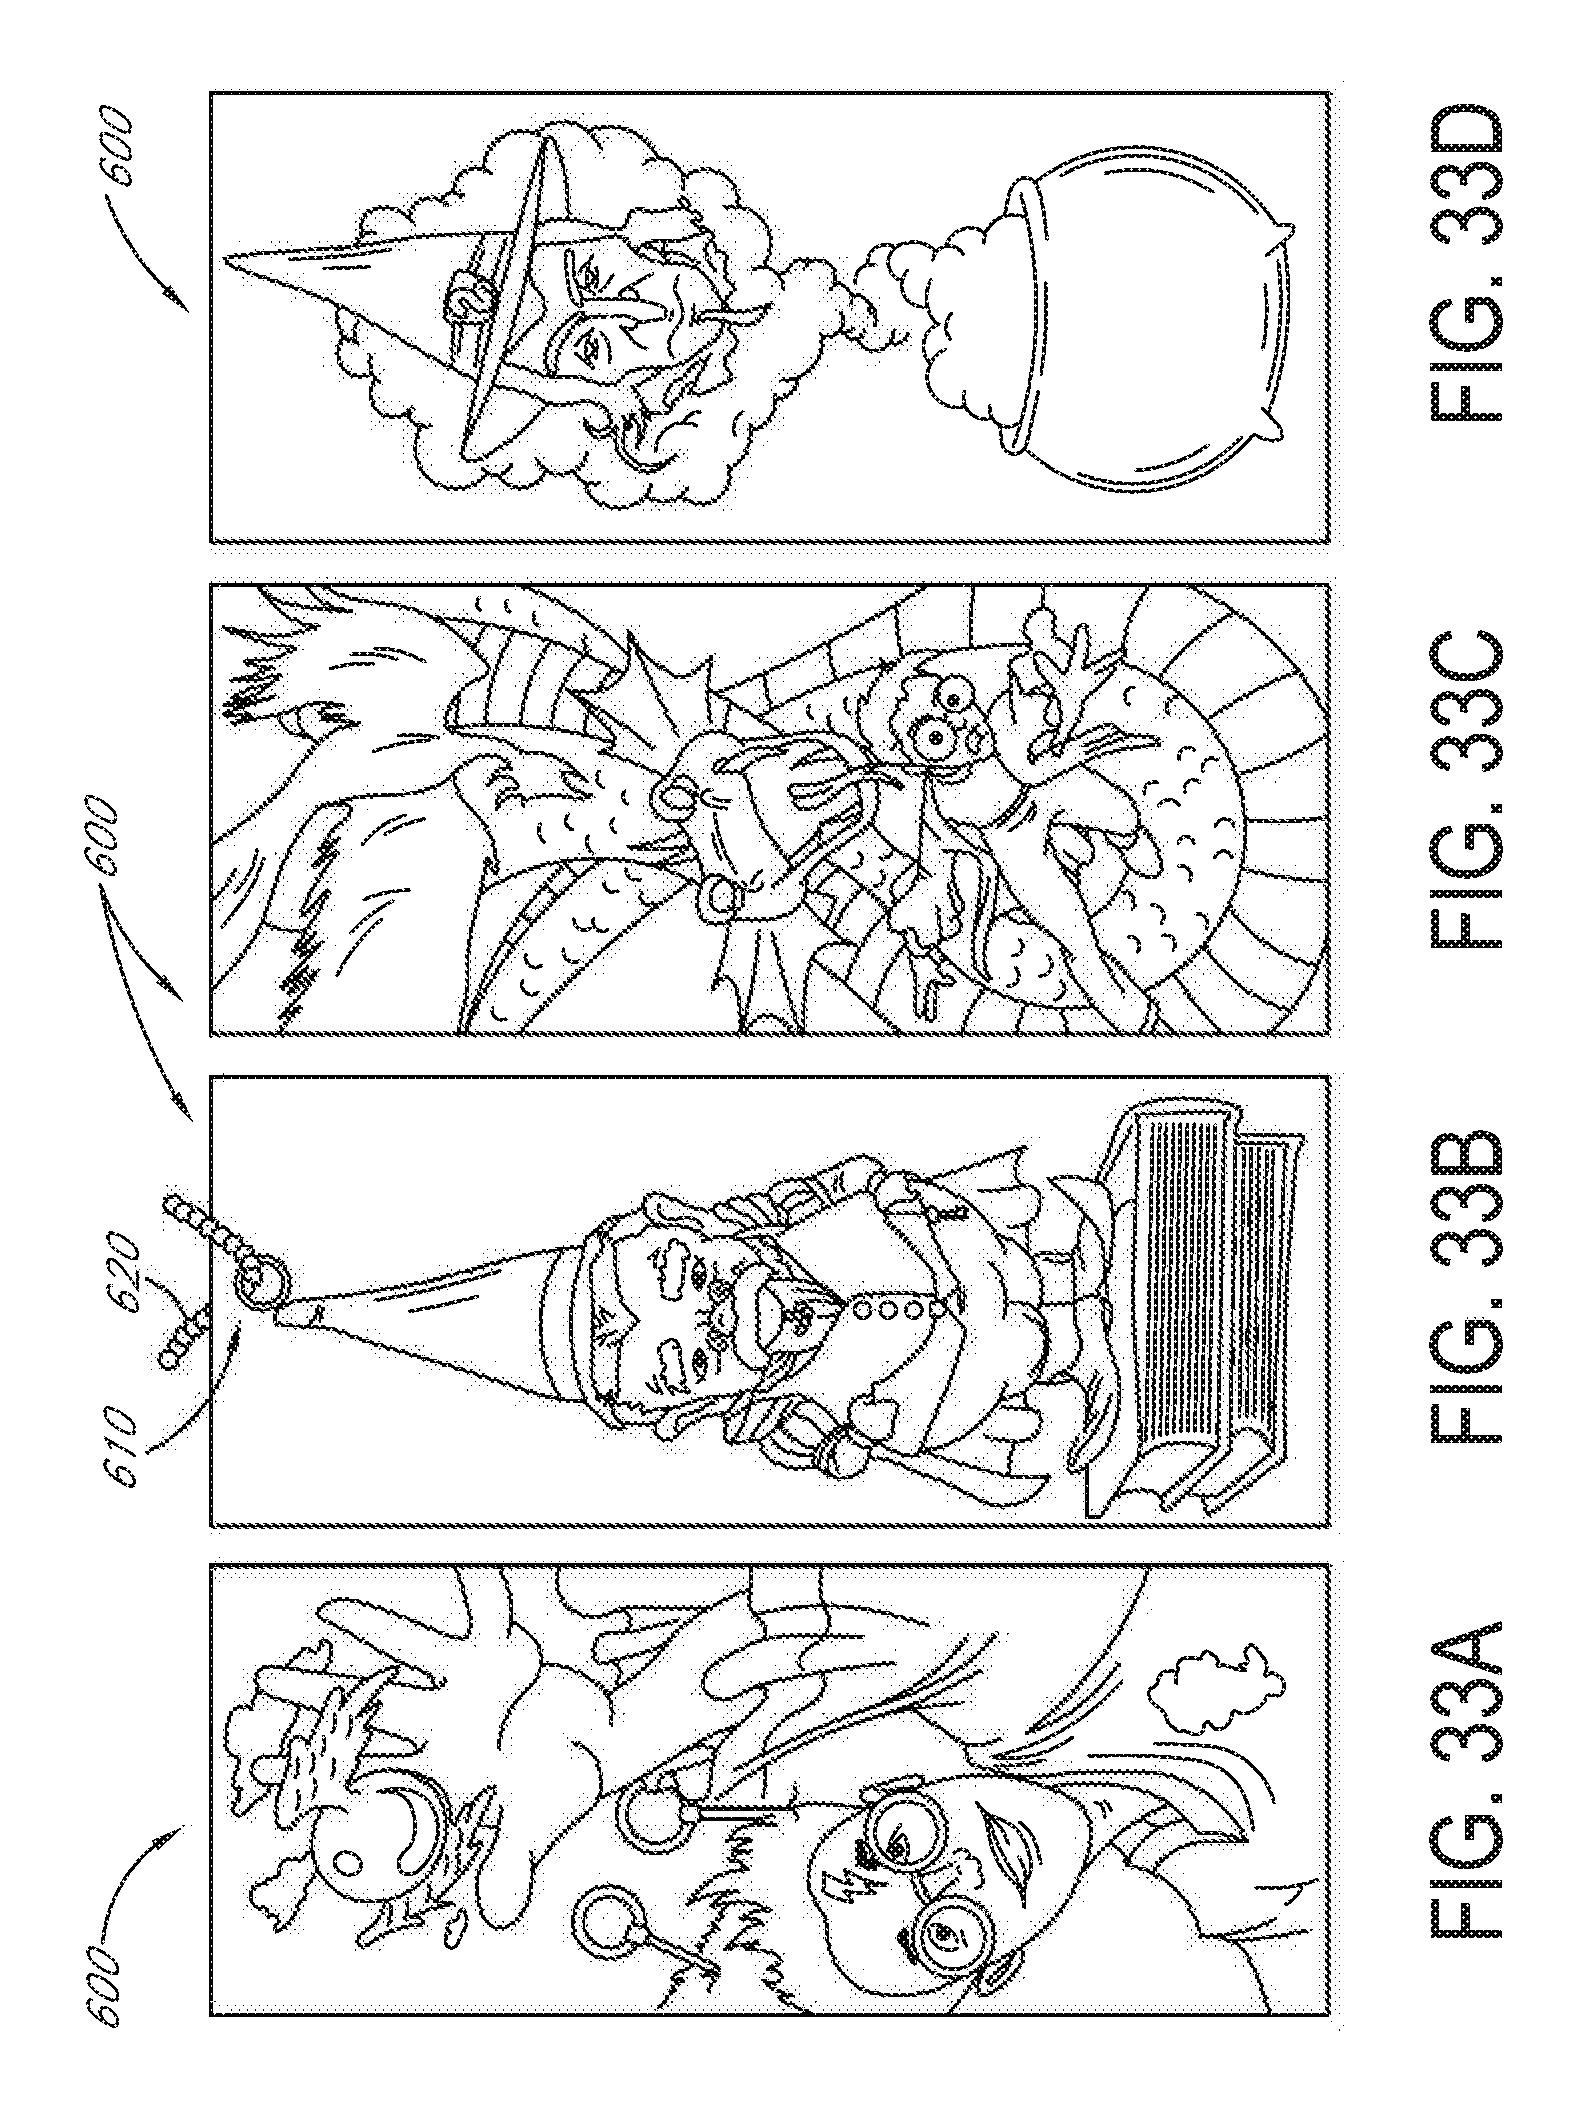 Patent US 10,179,283 B2